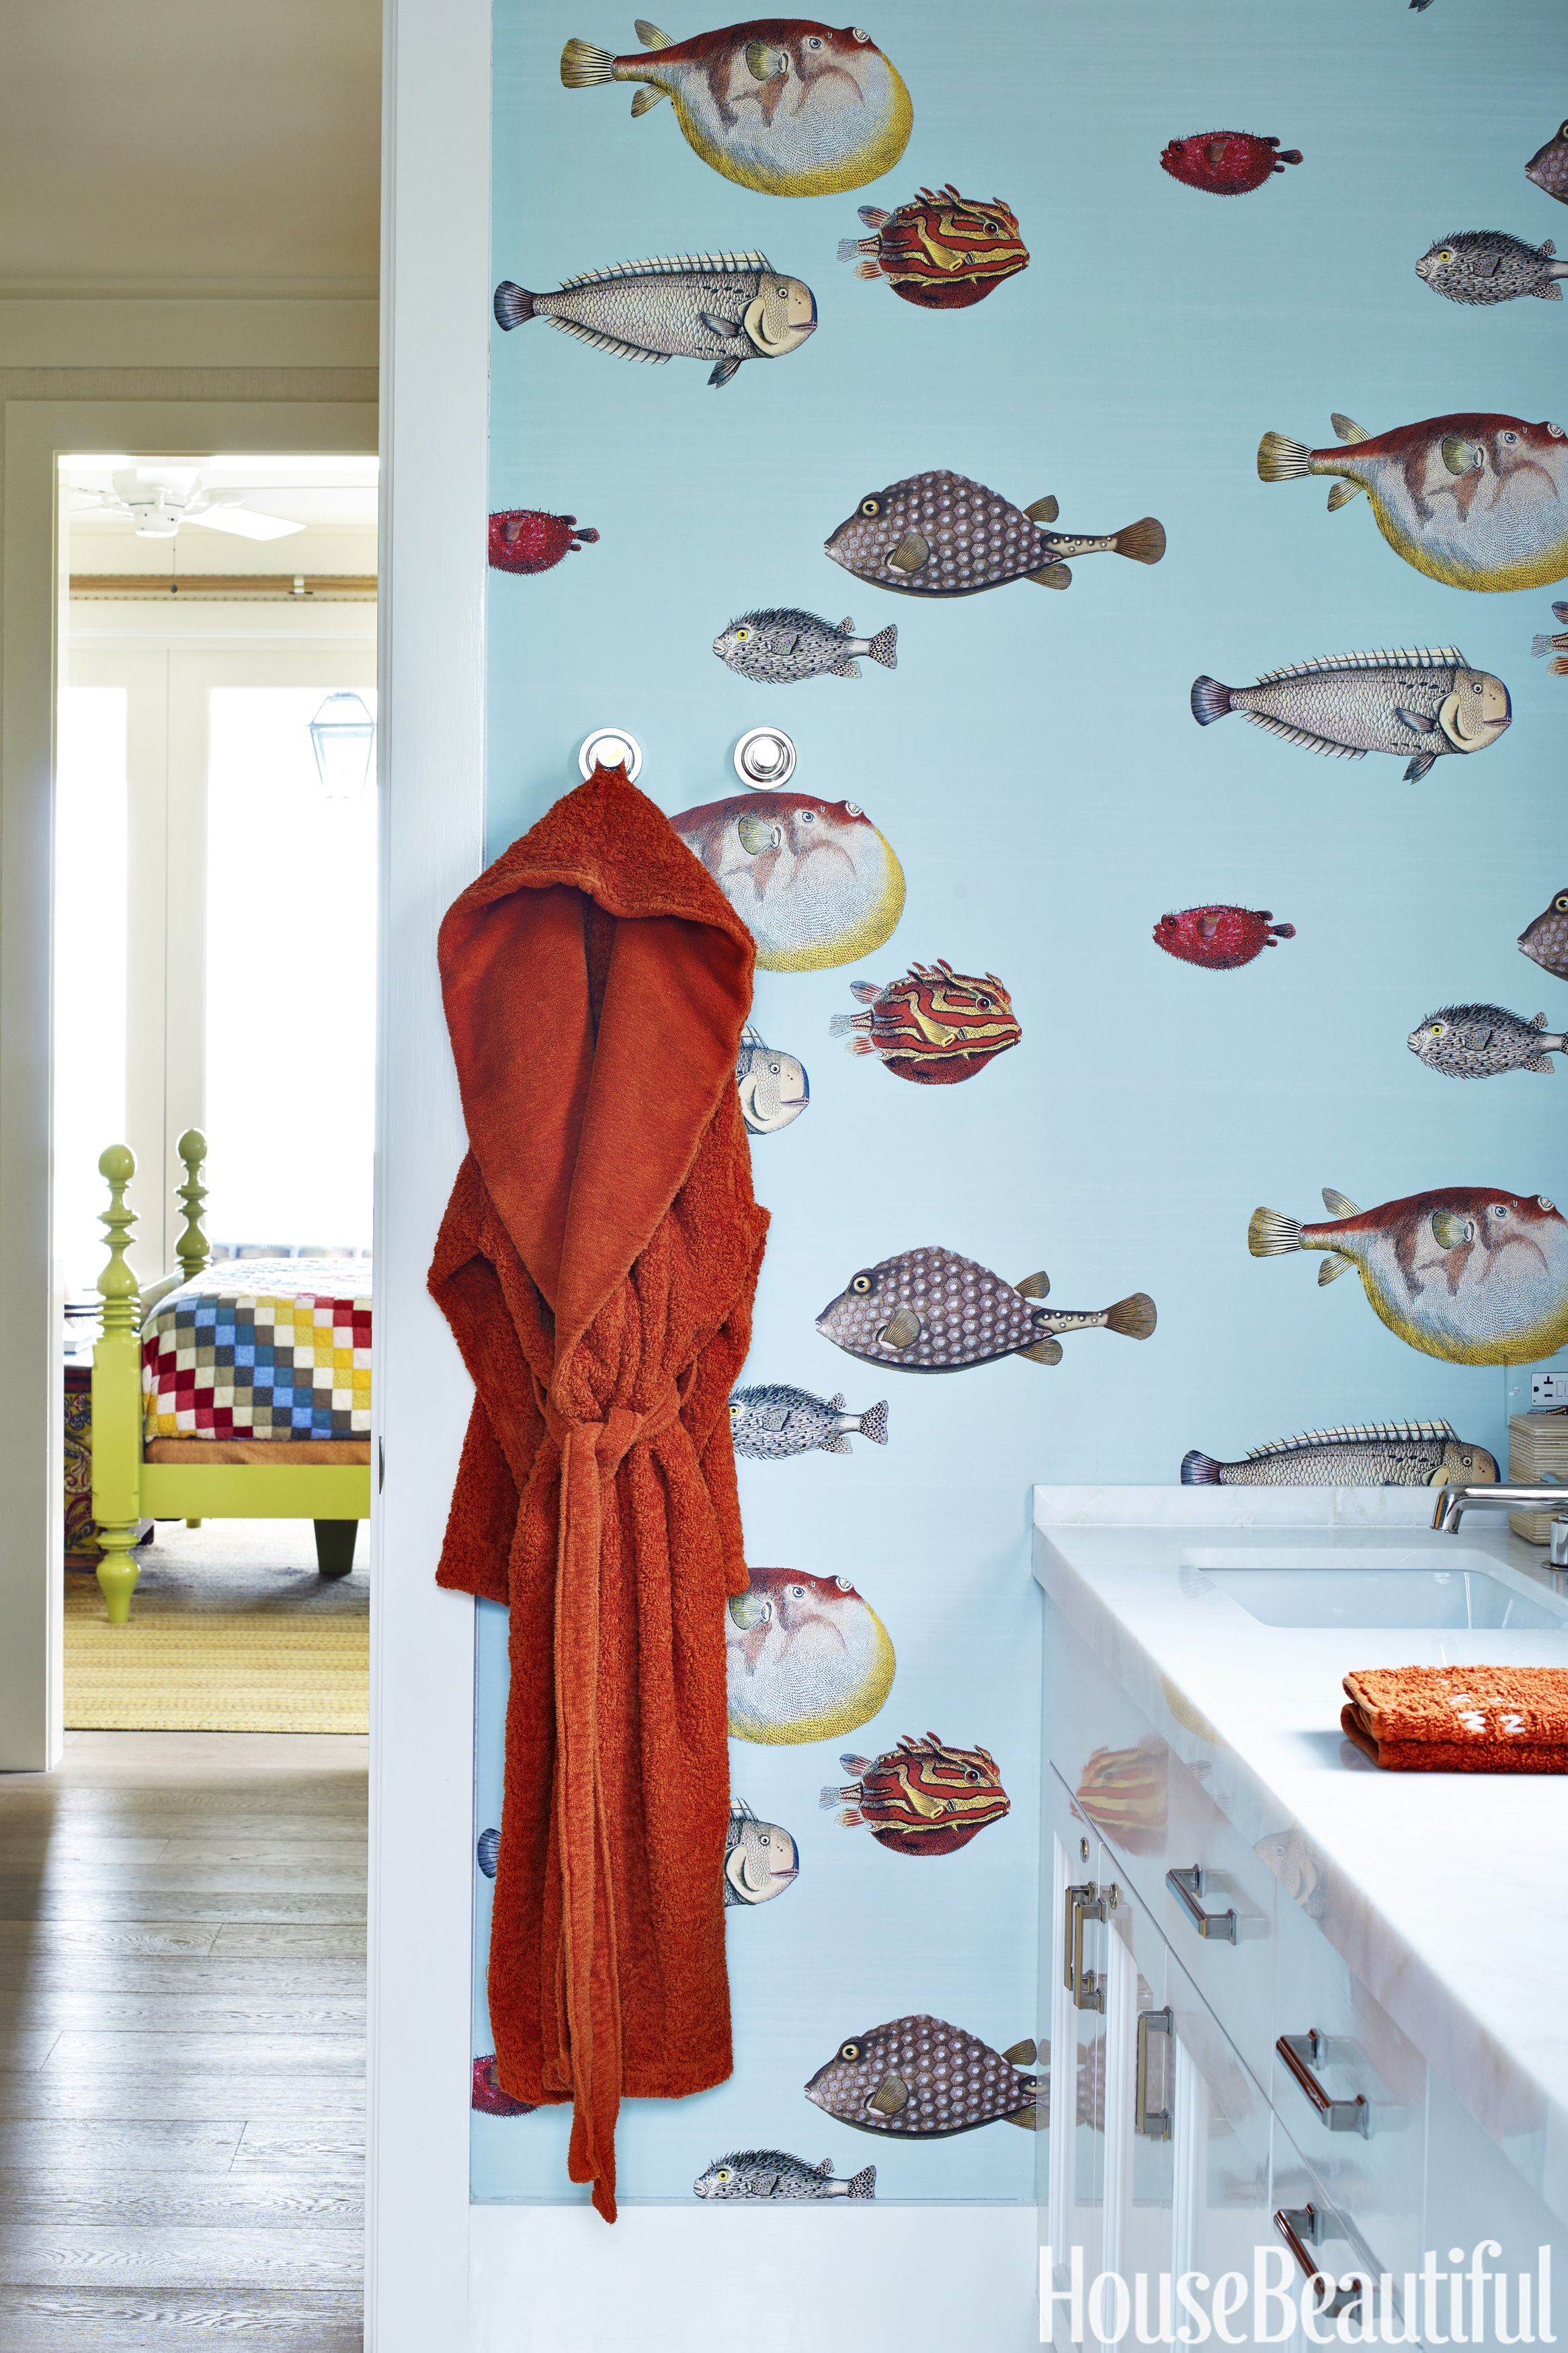 60 Best Bathroom Designs - Photos of Beautiful Bathroom Ideas to Try